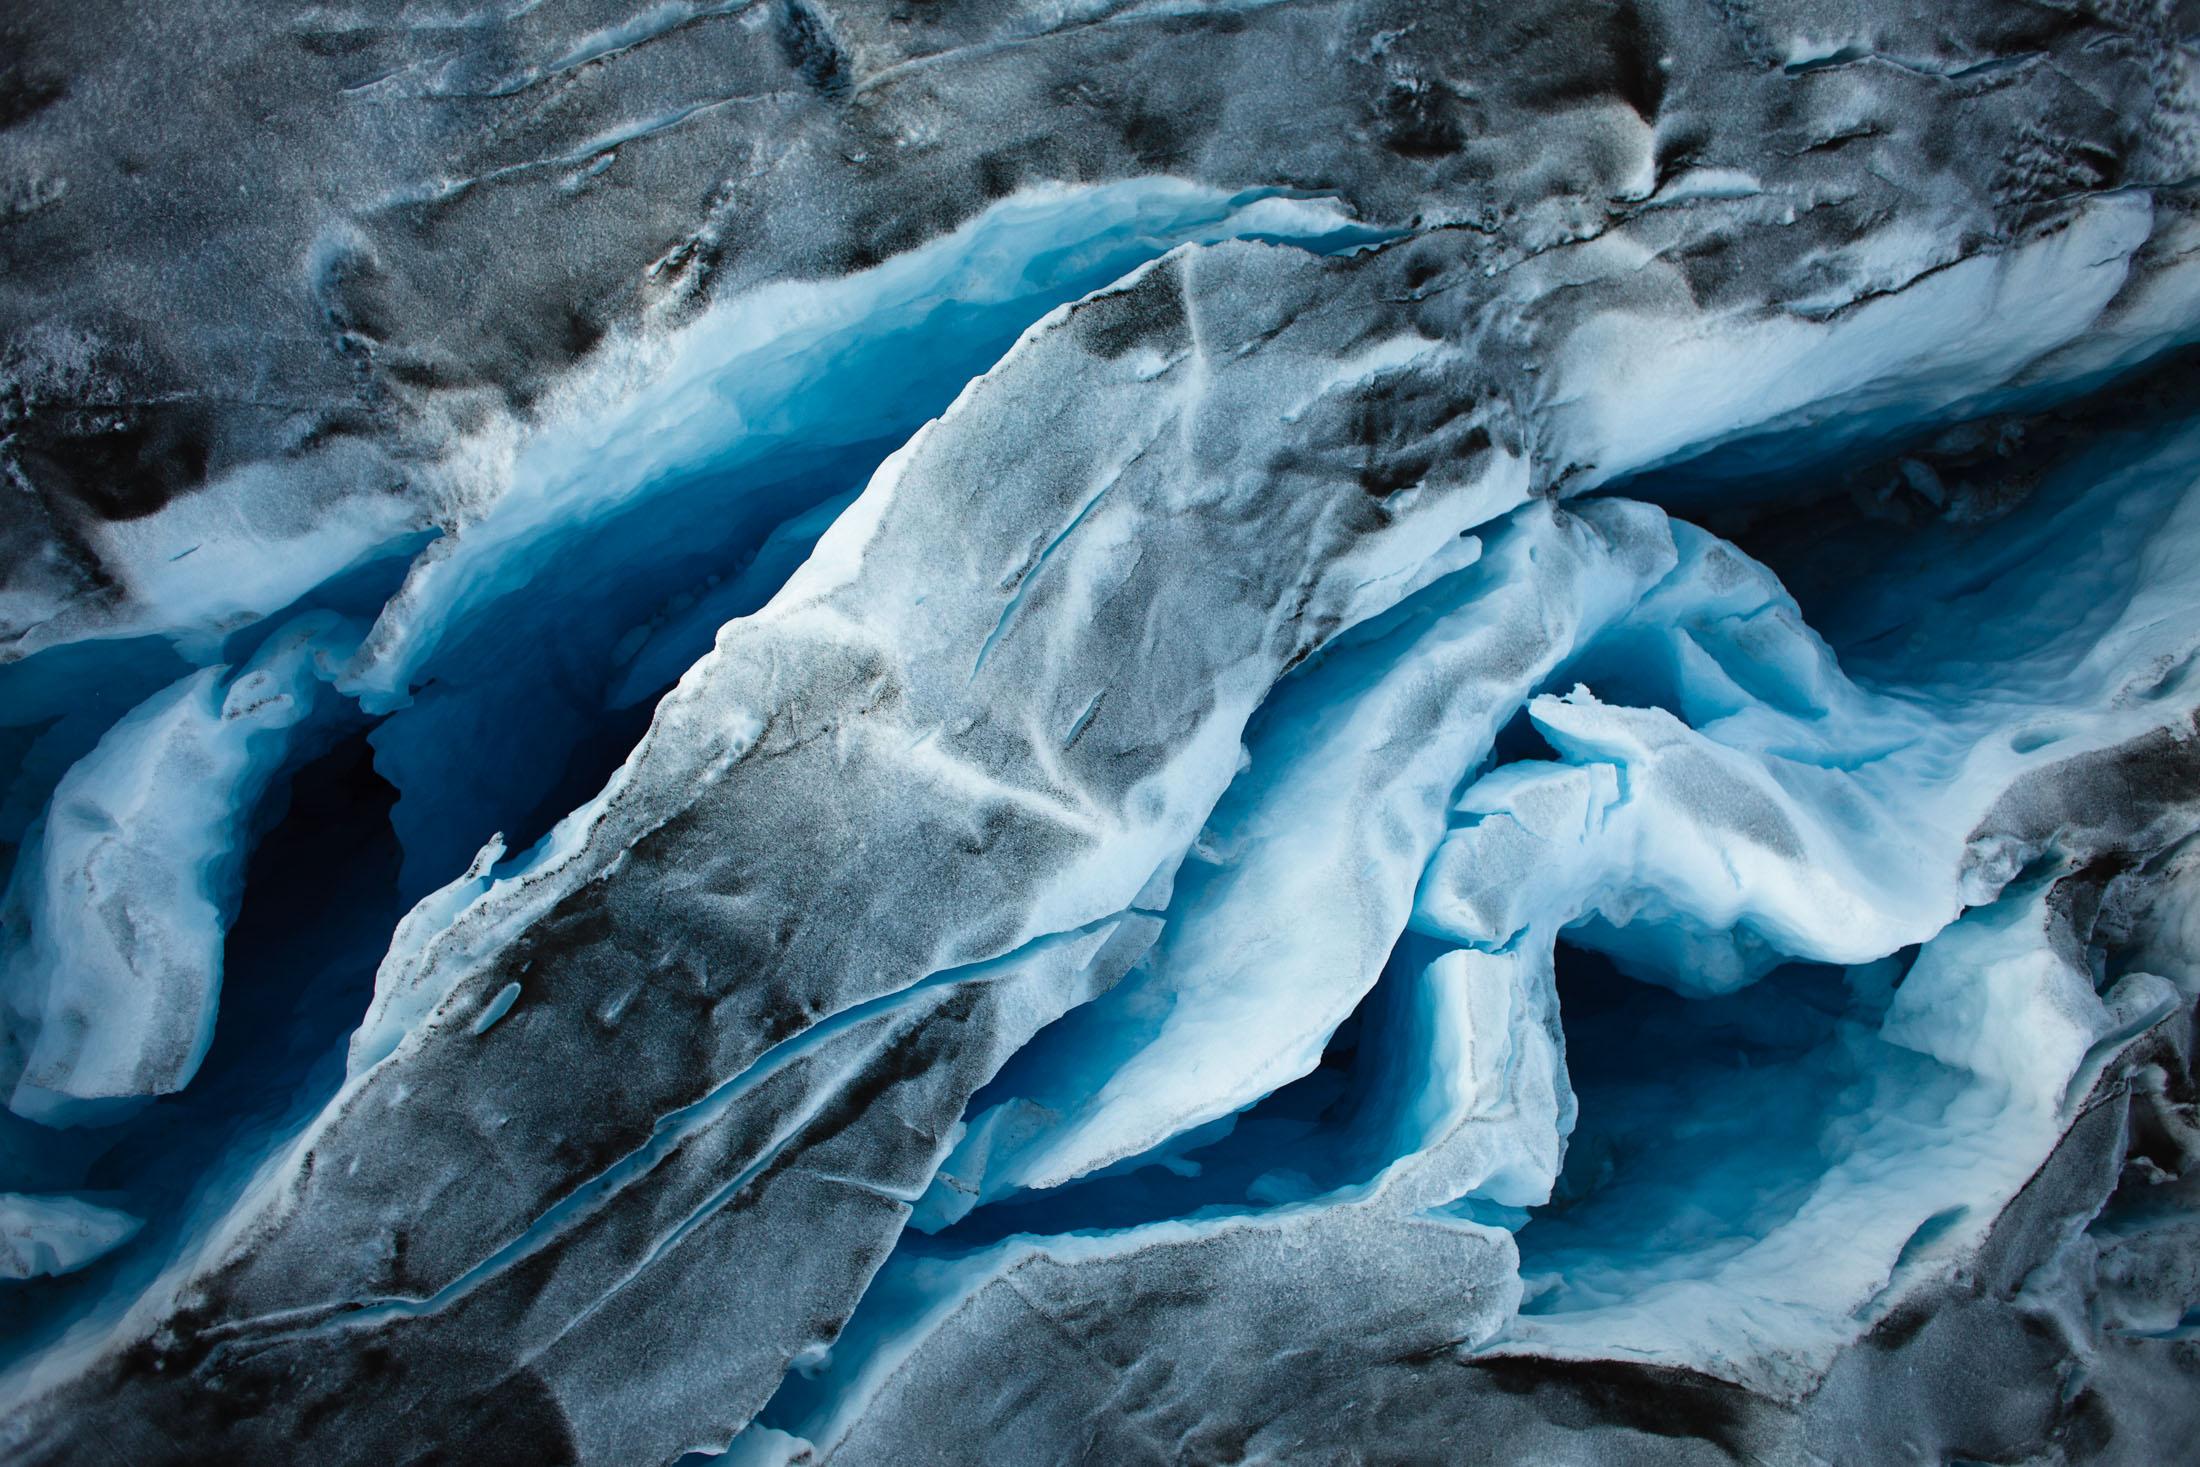 Crevasses on Kangerdlugssuaq glacier